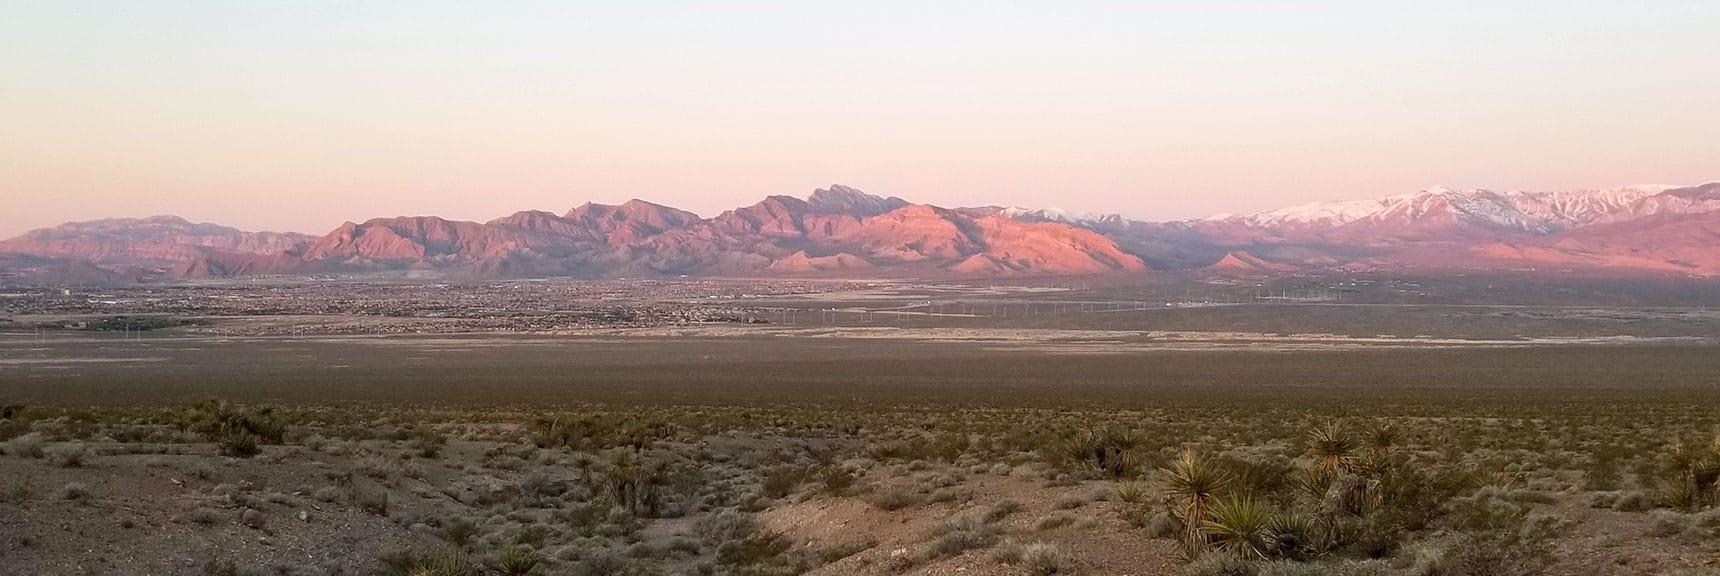 Sunrise view toward La Madre Mountains Wilderness | Gass Peak Eastern Summit Ultra-marathon Adventure, Nevada